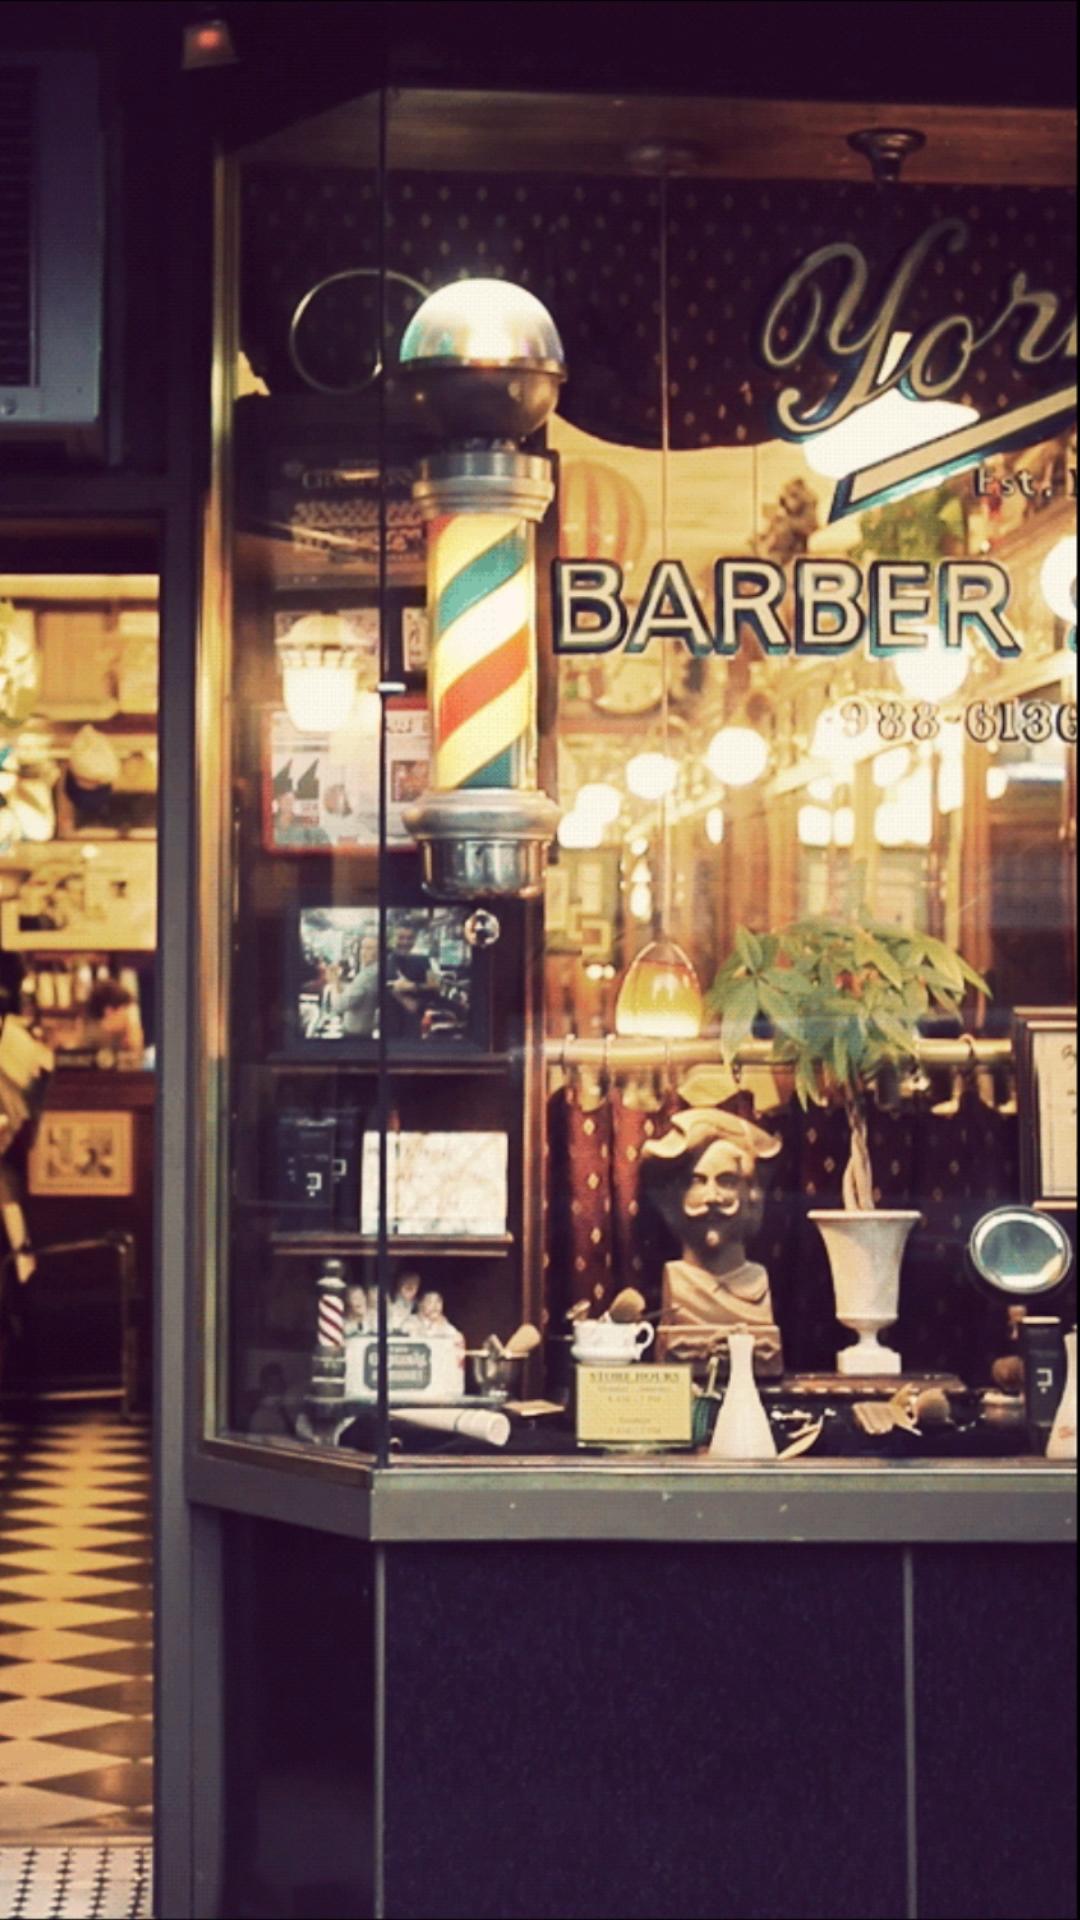 Cinemagraph Chez Le Barbier Video Barbearias Retro Ideias Para Barbearias Poste De Barbearia